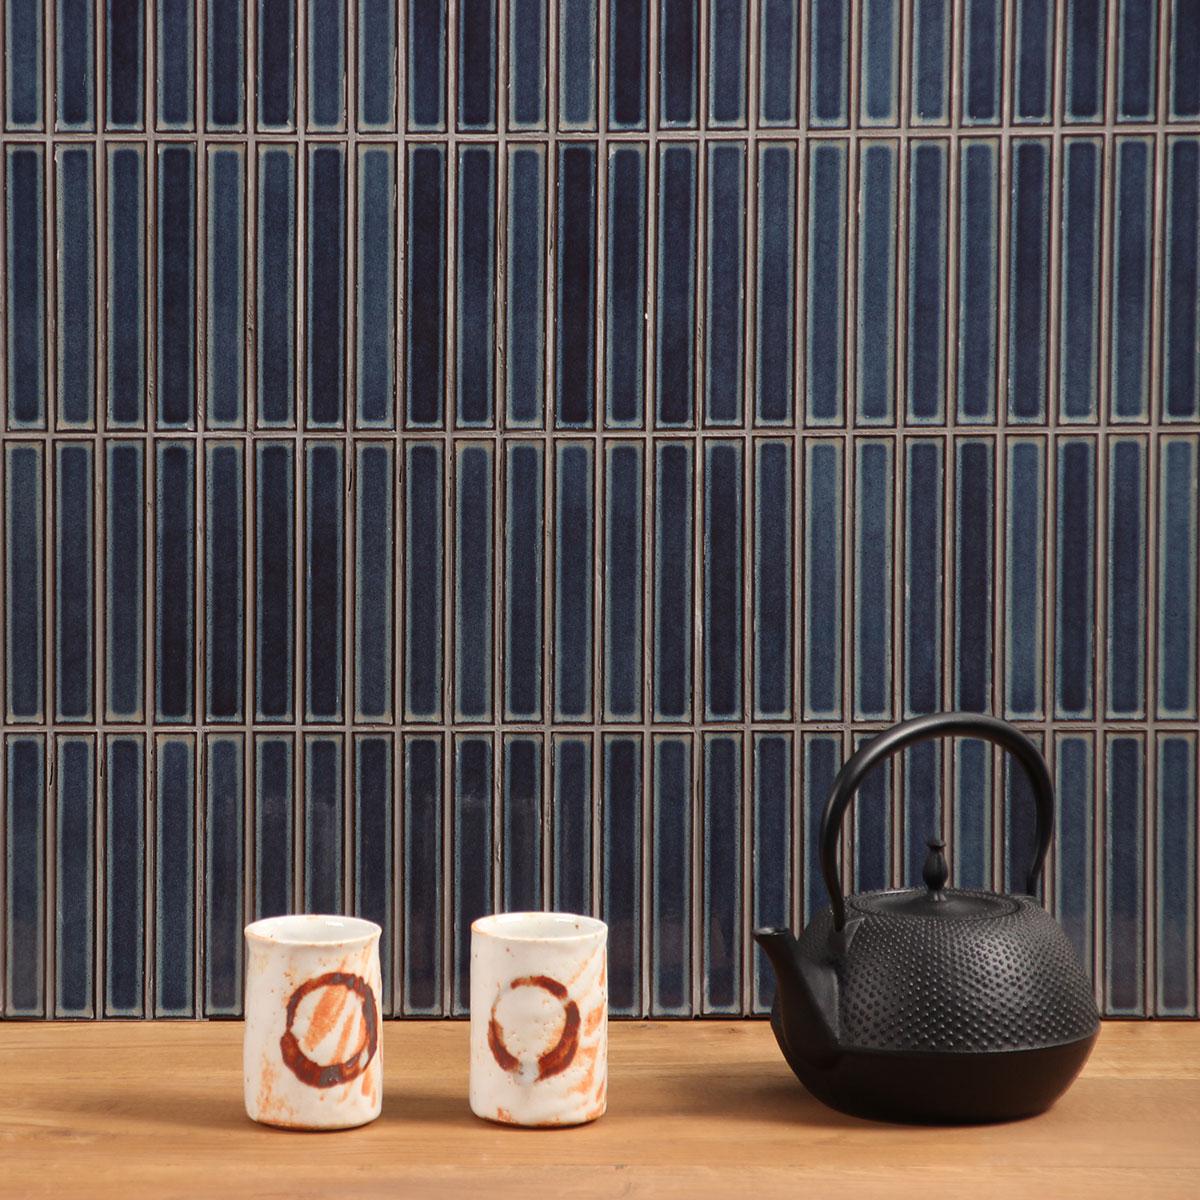 Shino Stax - Denim - Feature Tiles - Stone3 Brisbane